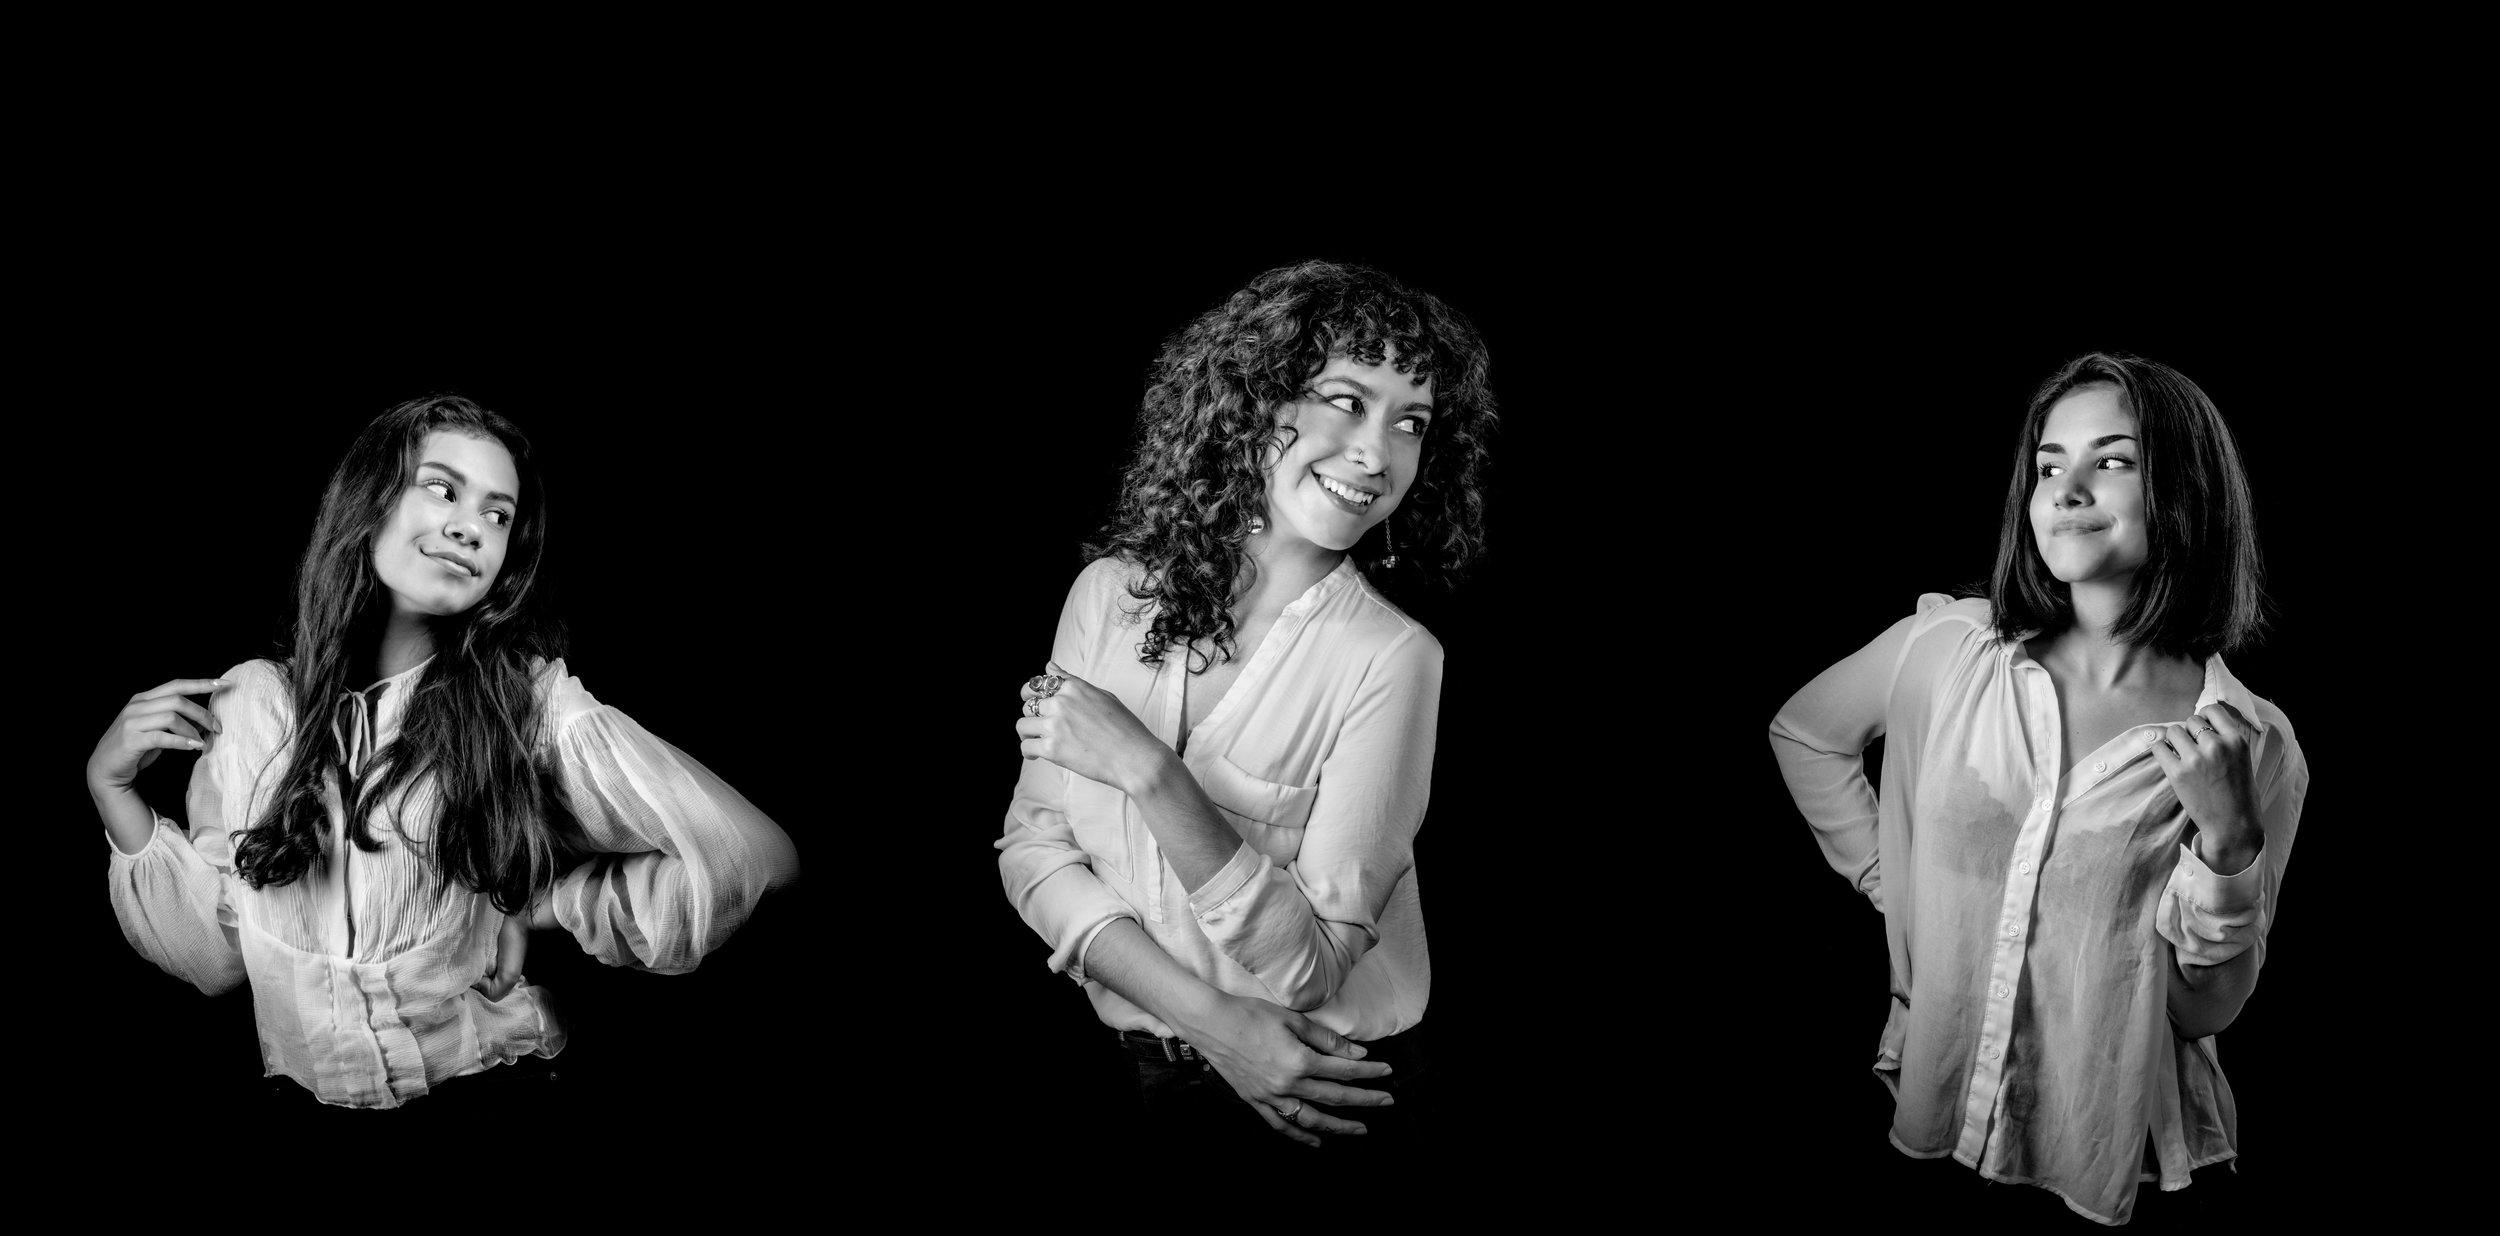 jonathan-mcphail-photography-new-york-nyc-portraits-headshots-family-portraits-descendants-2-2.jpg